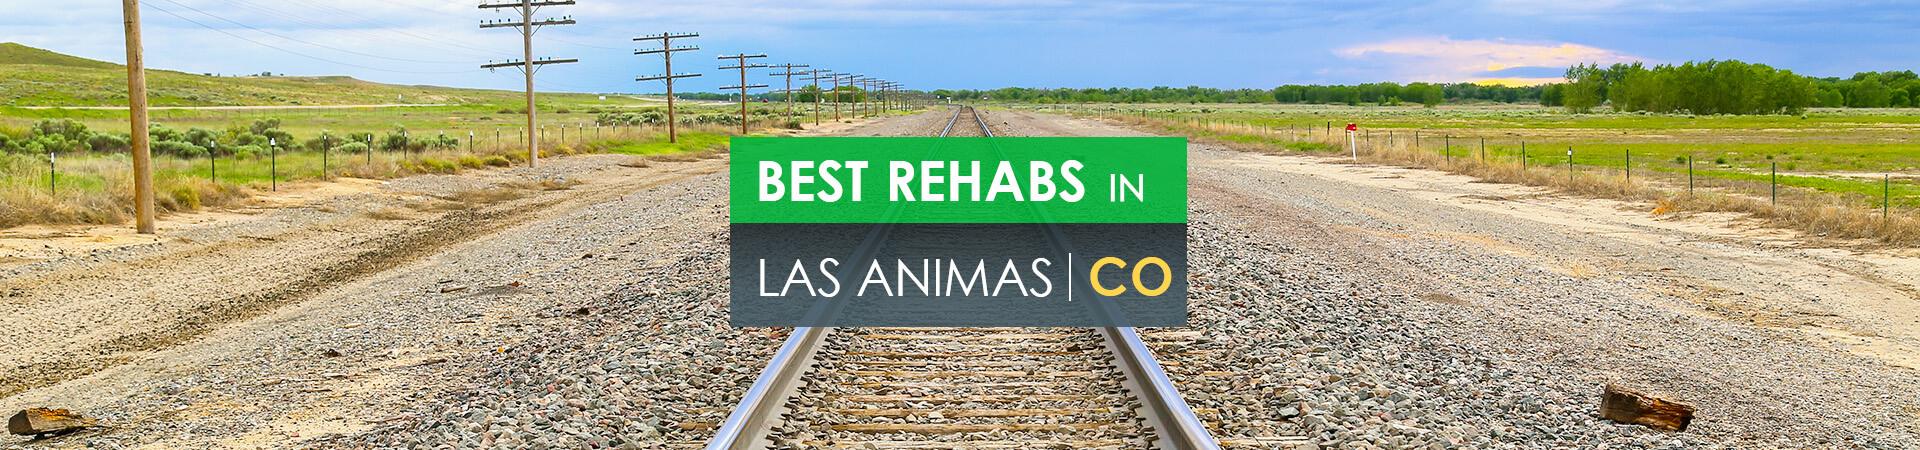 Best rehabs in Las Animas, CO